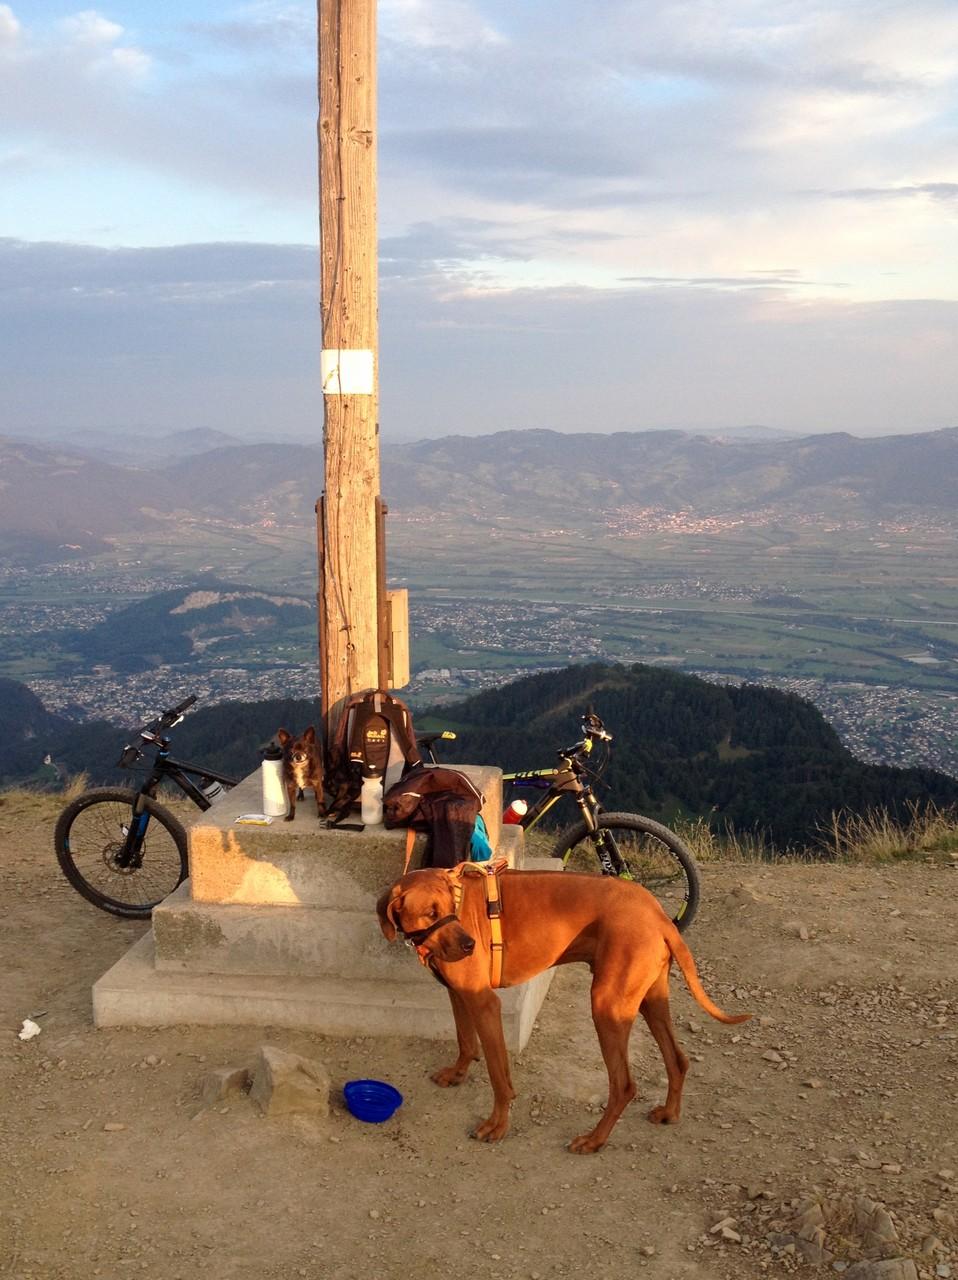 Hohe Kugel, 1645 m